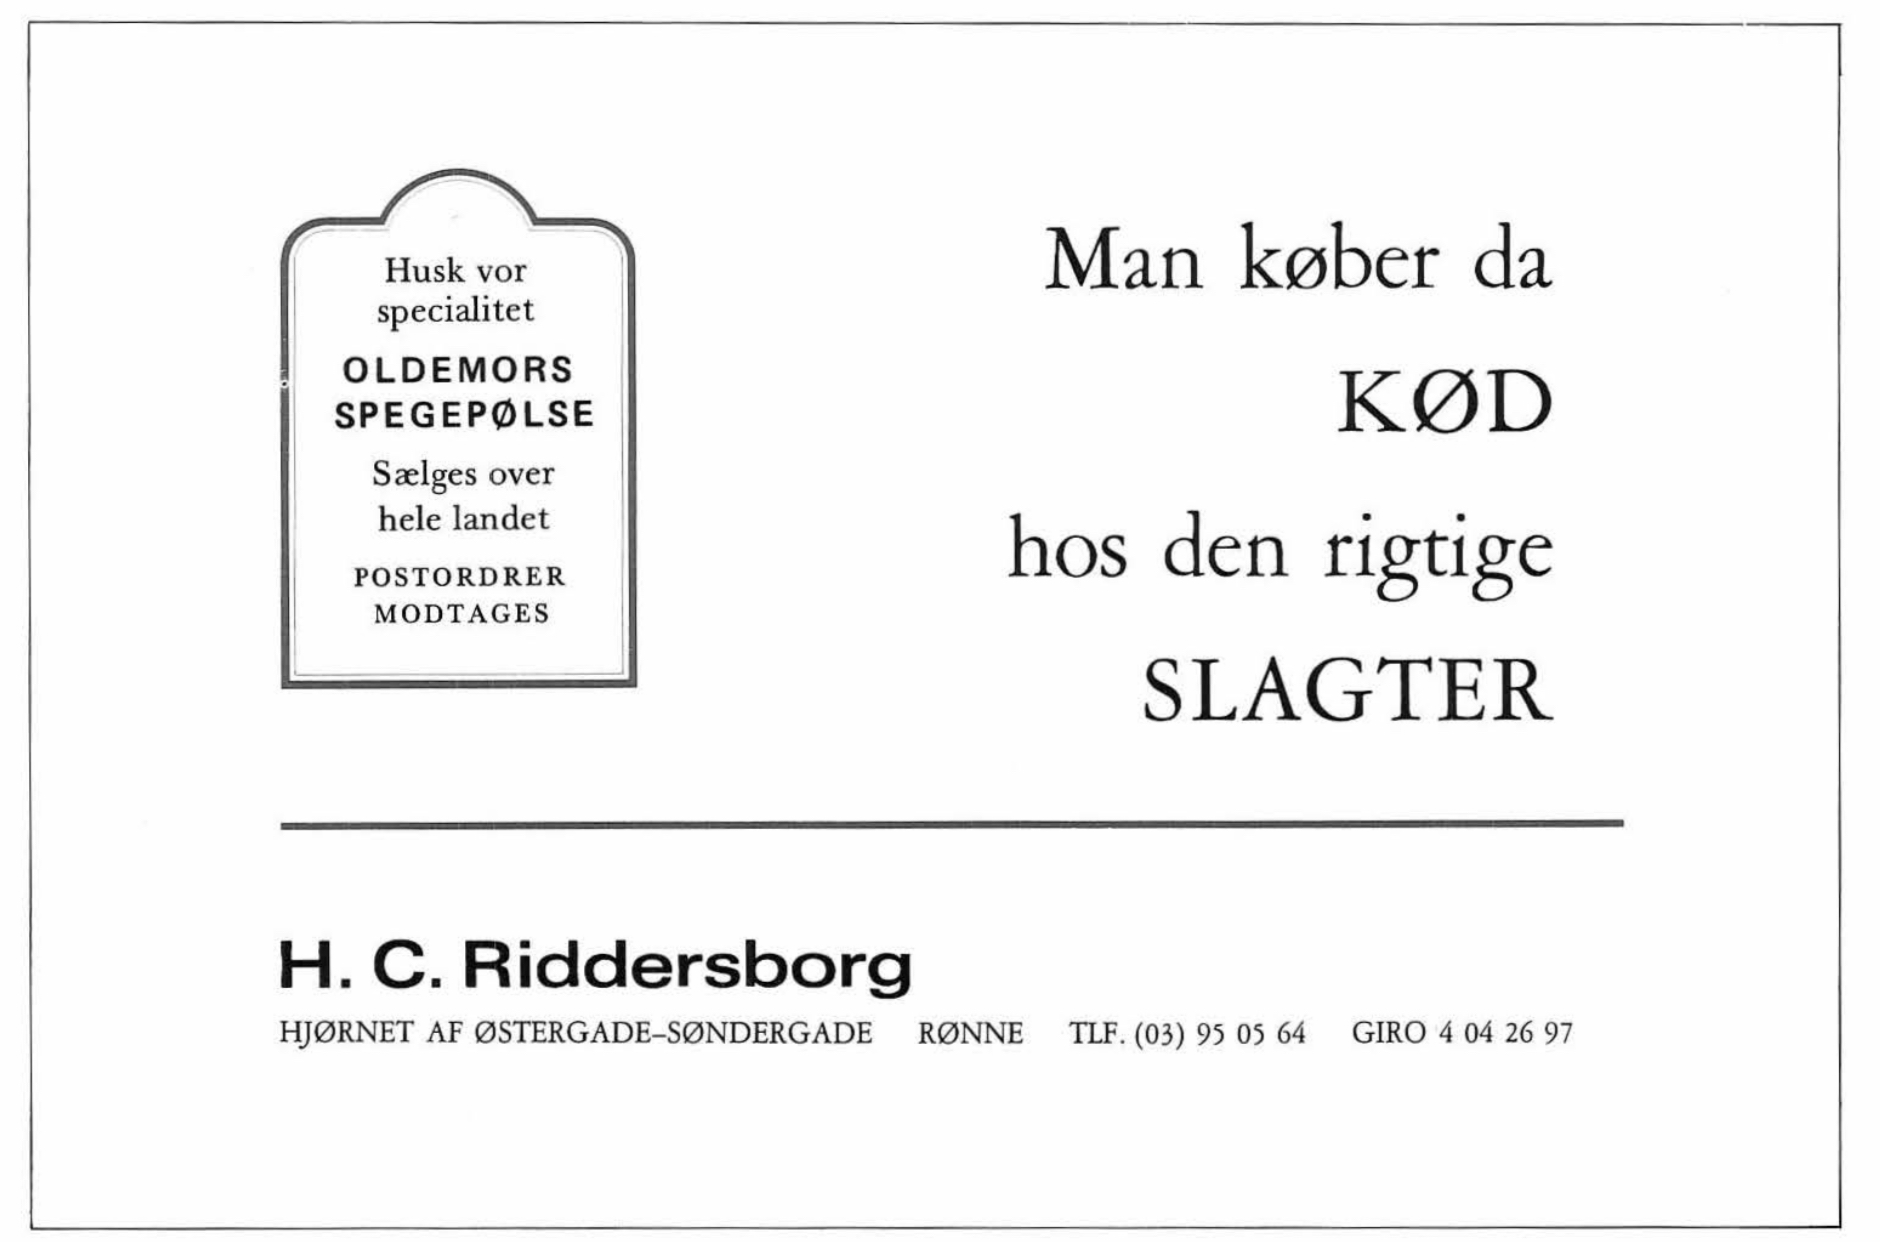 H. C. Riddersborg - Reklame 1984